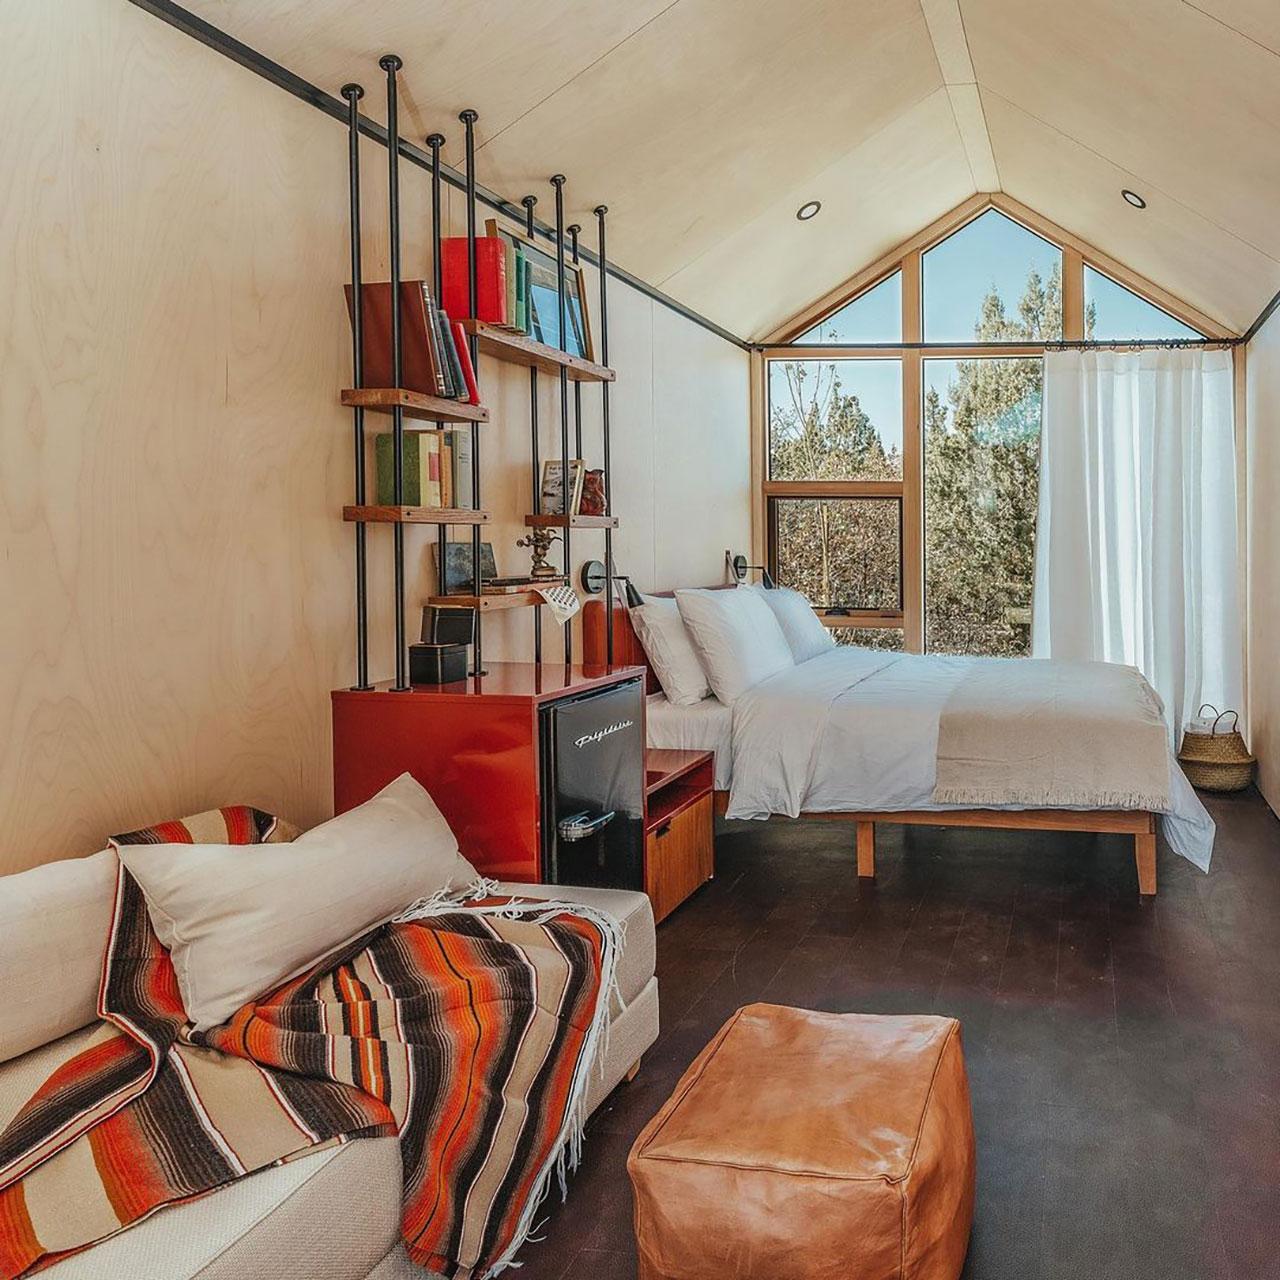 Cabin interior.Photography by Aleks Danielle Butman.